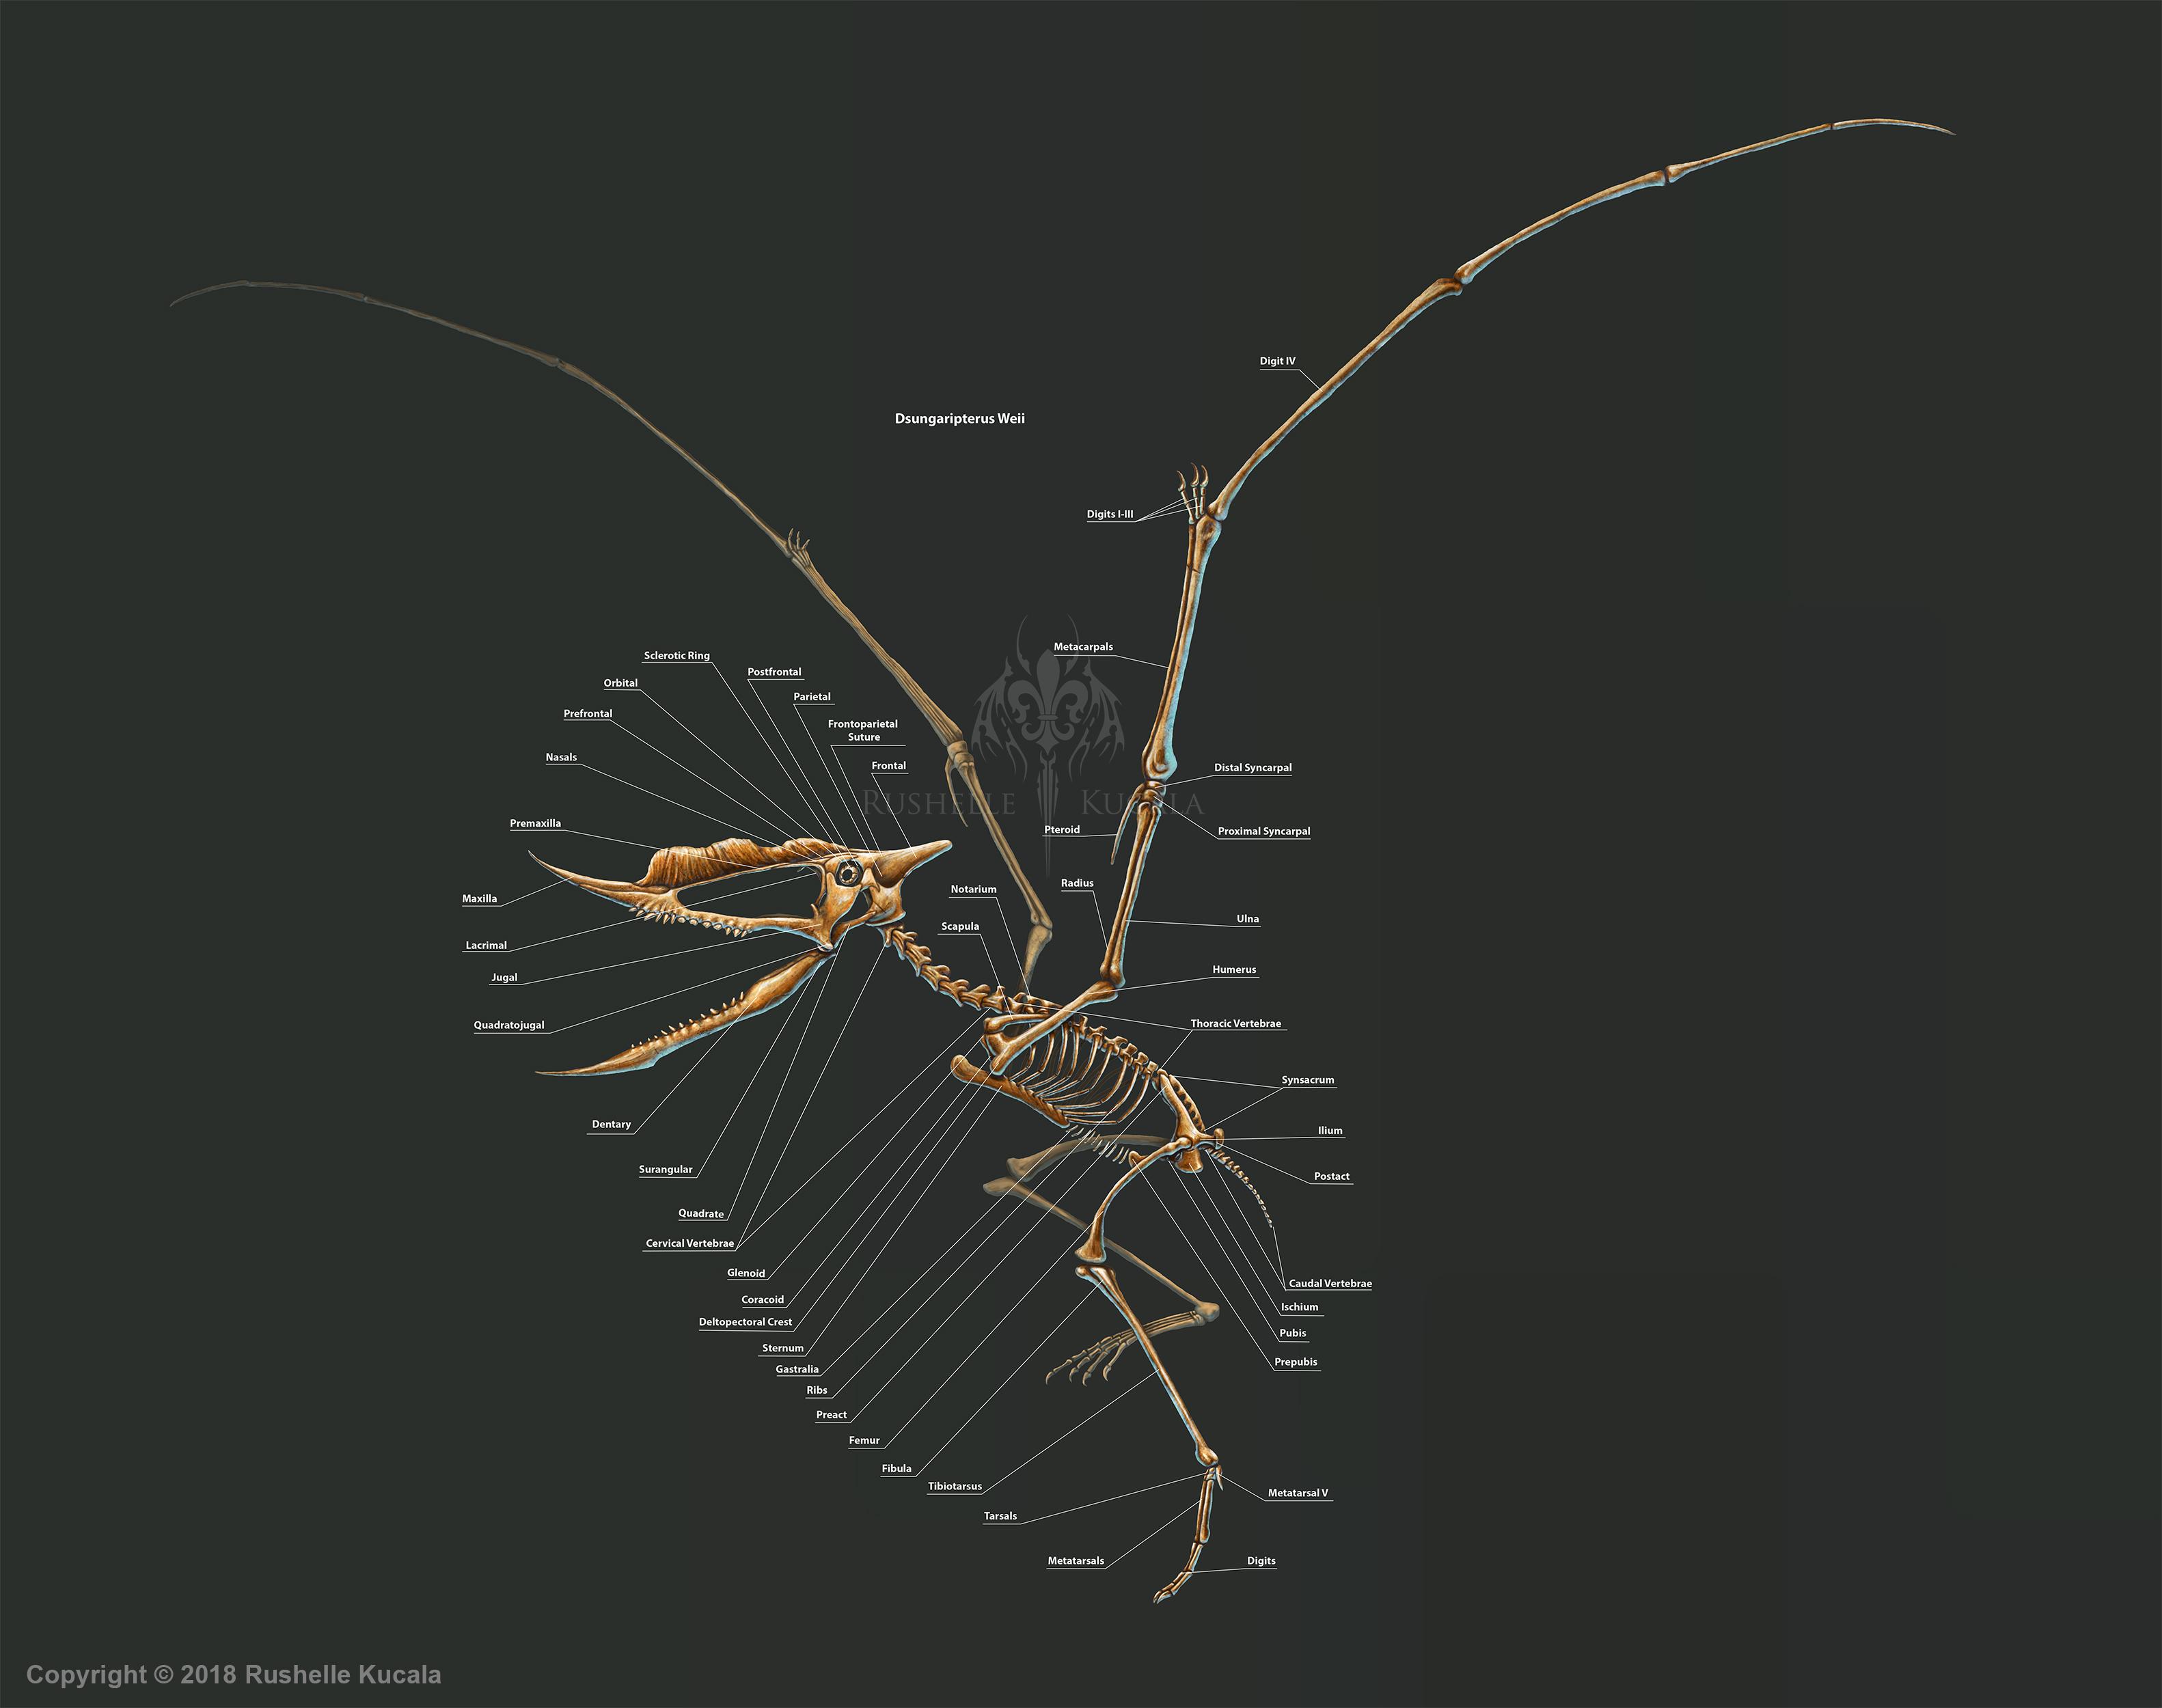 Dsungaripterus Weii Skeleton Study by TheDragonofDoom